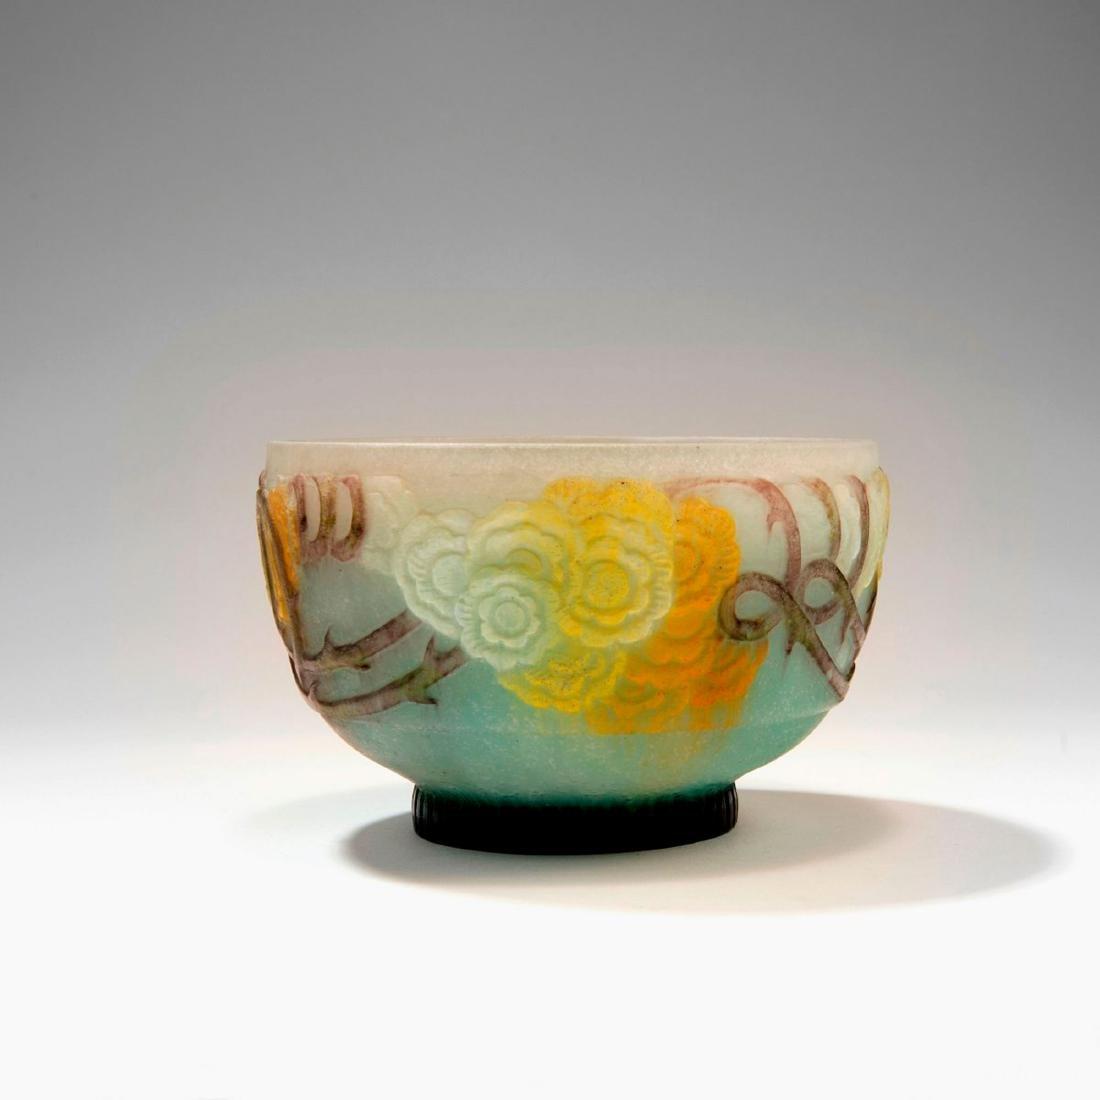 'Roses grimpantes' bowl, 1920s